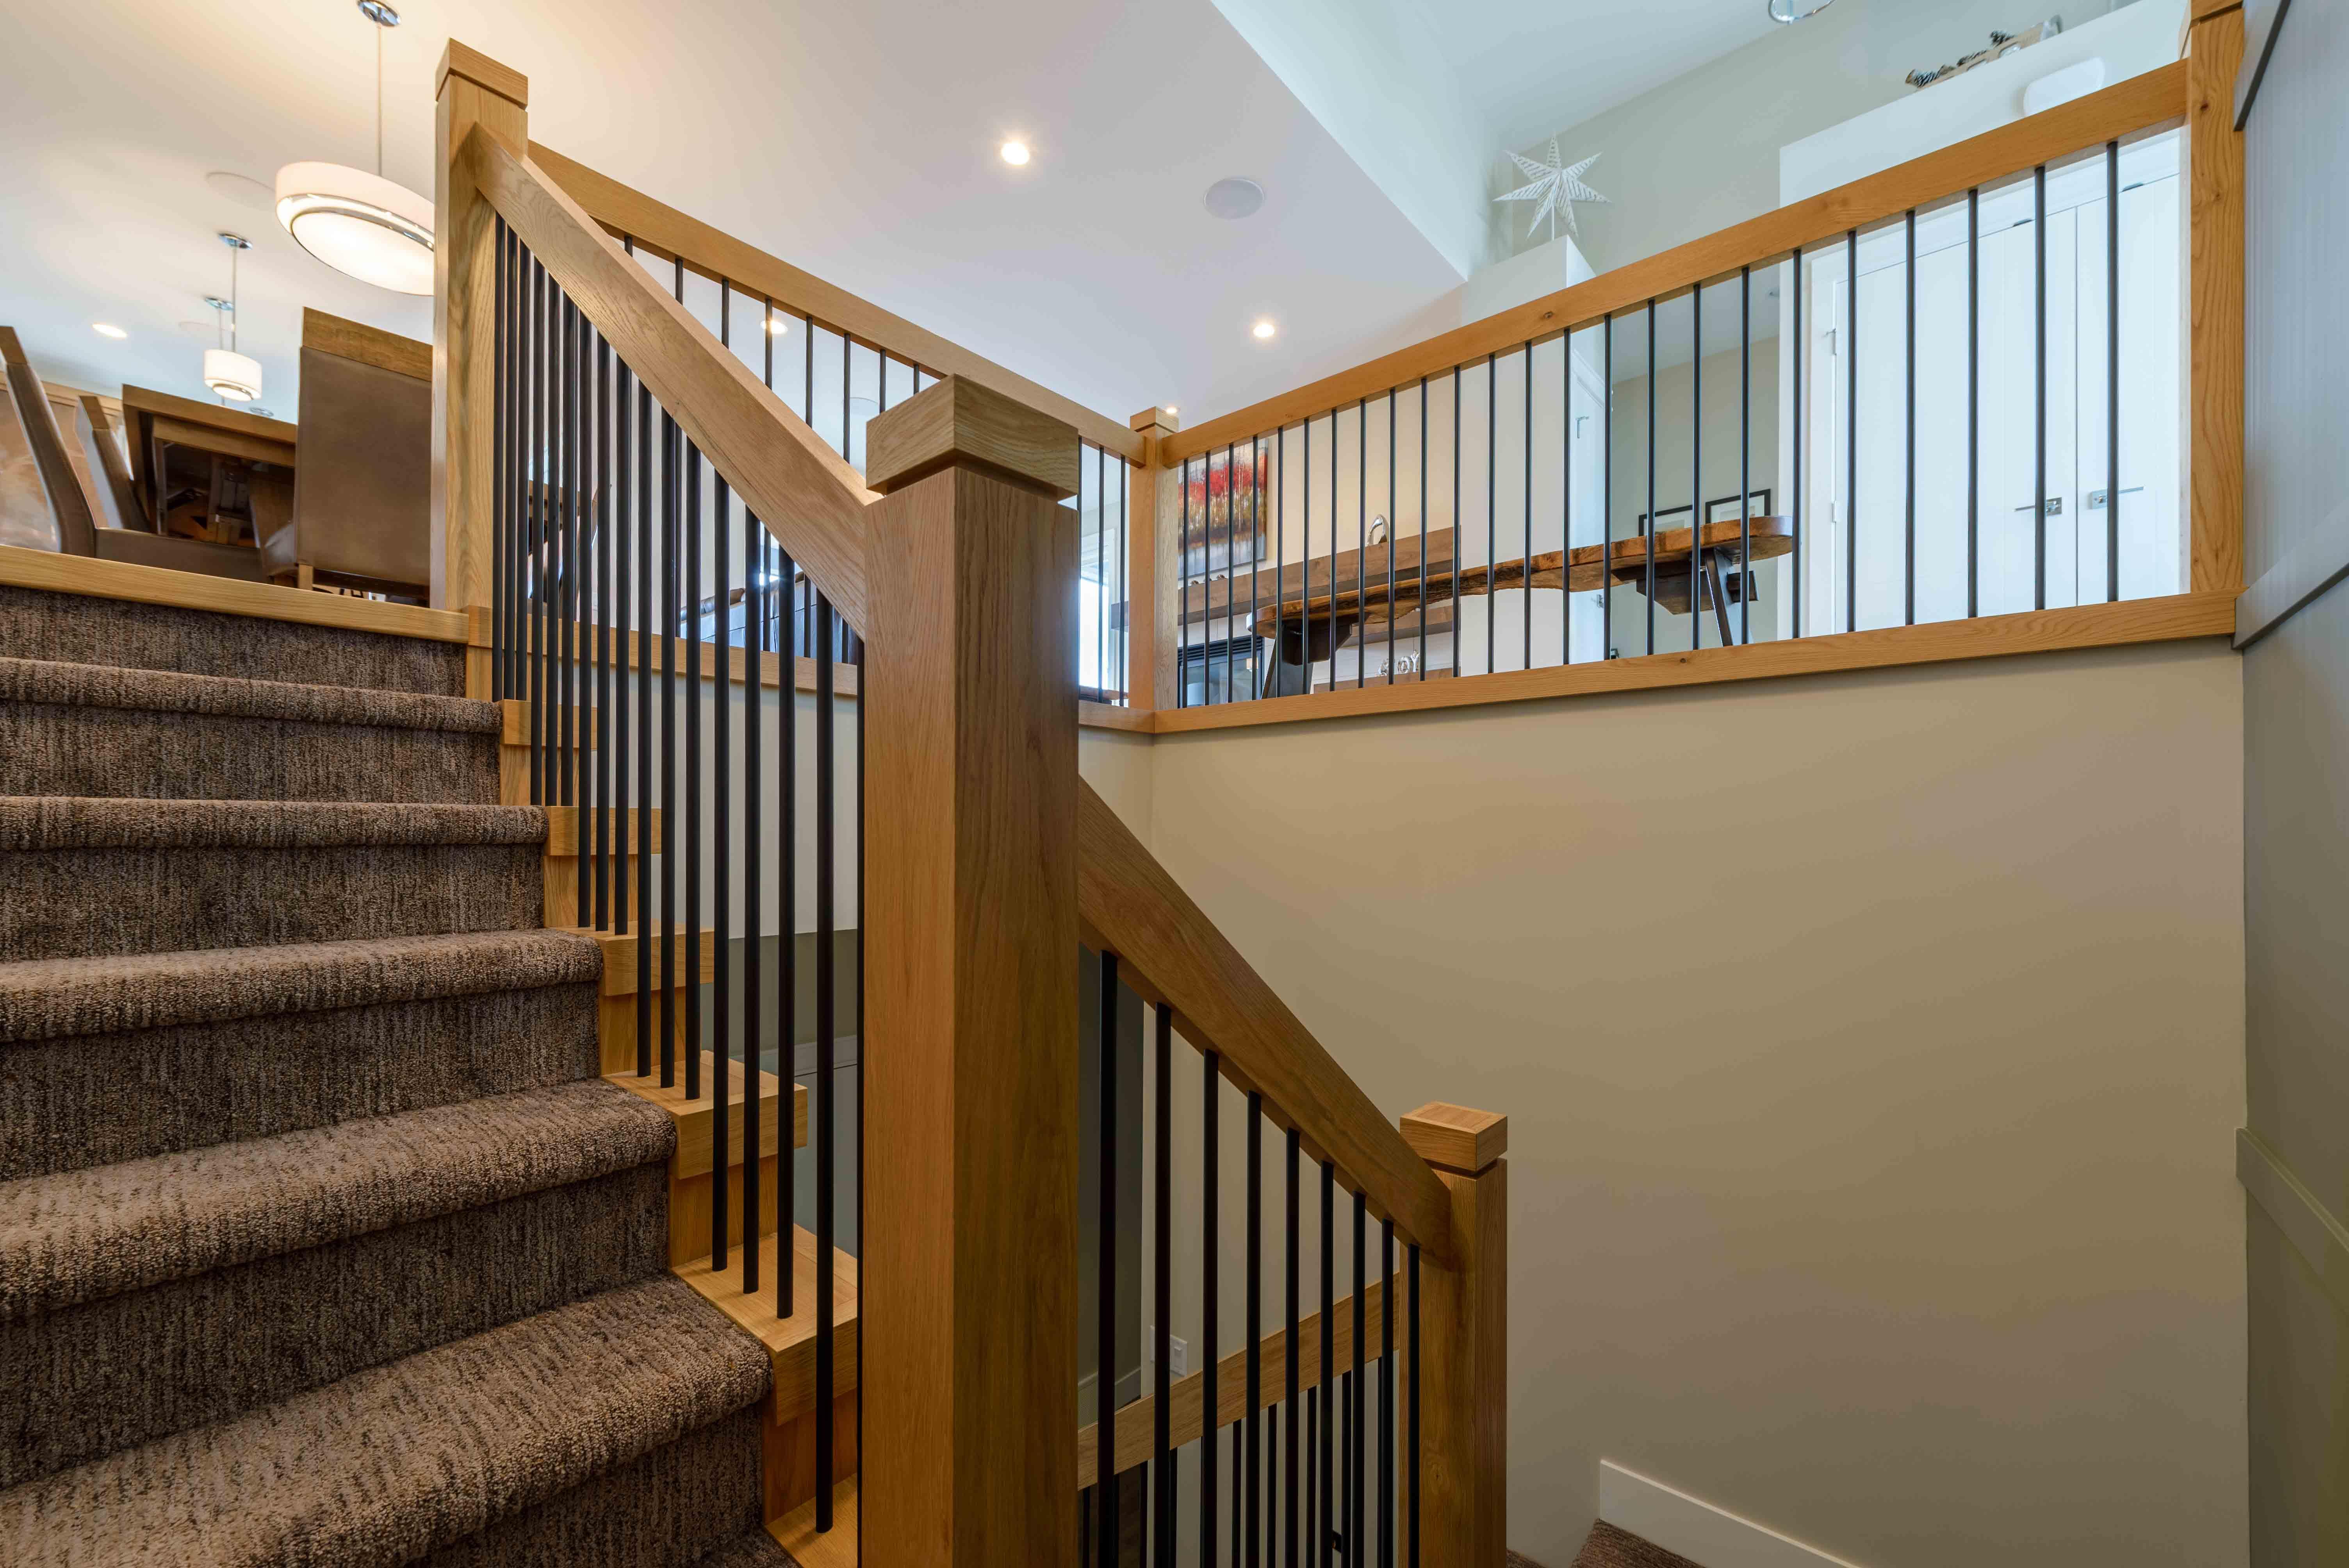 Shuswap staircase railings